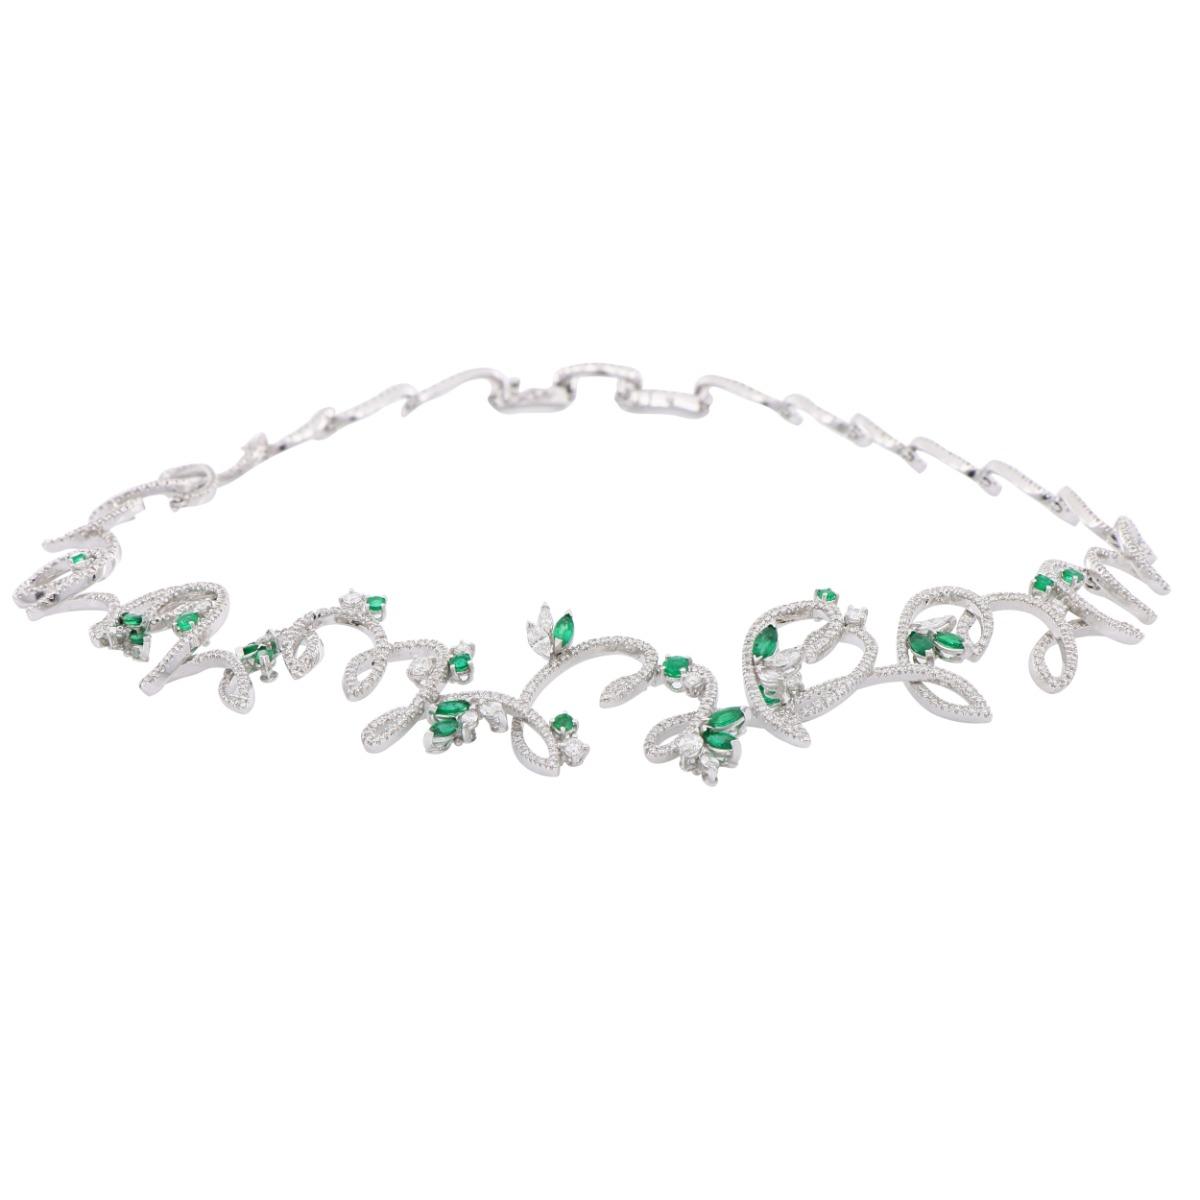 Emerald and Diamond Leaf Necklace